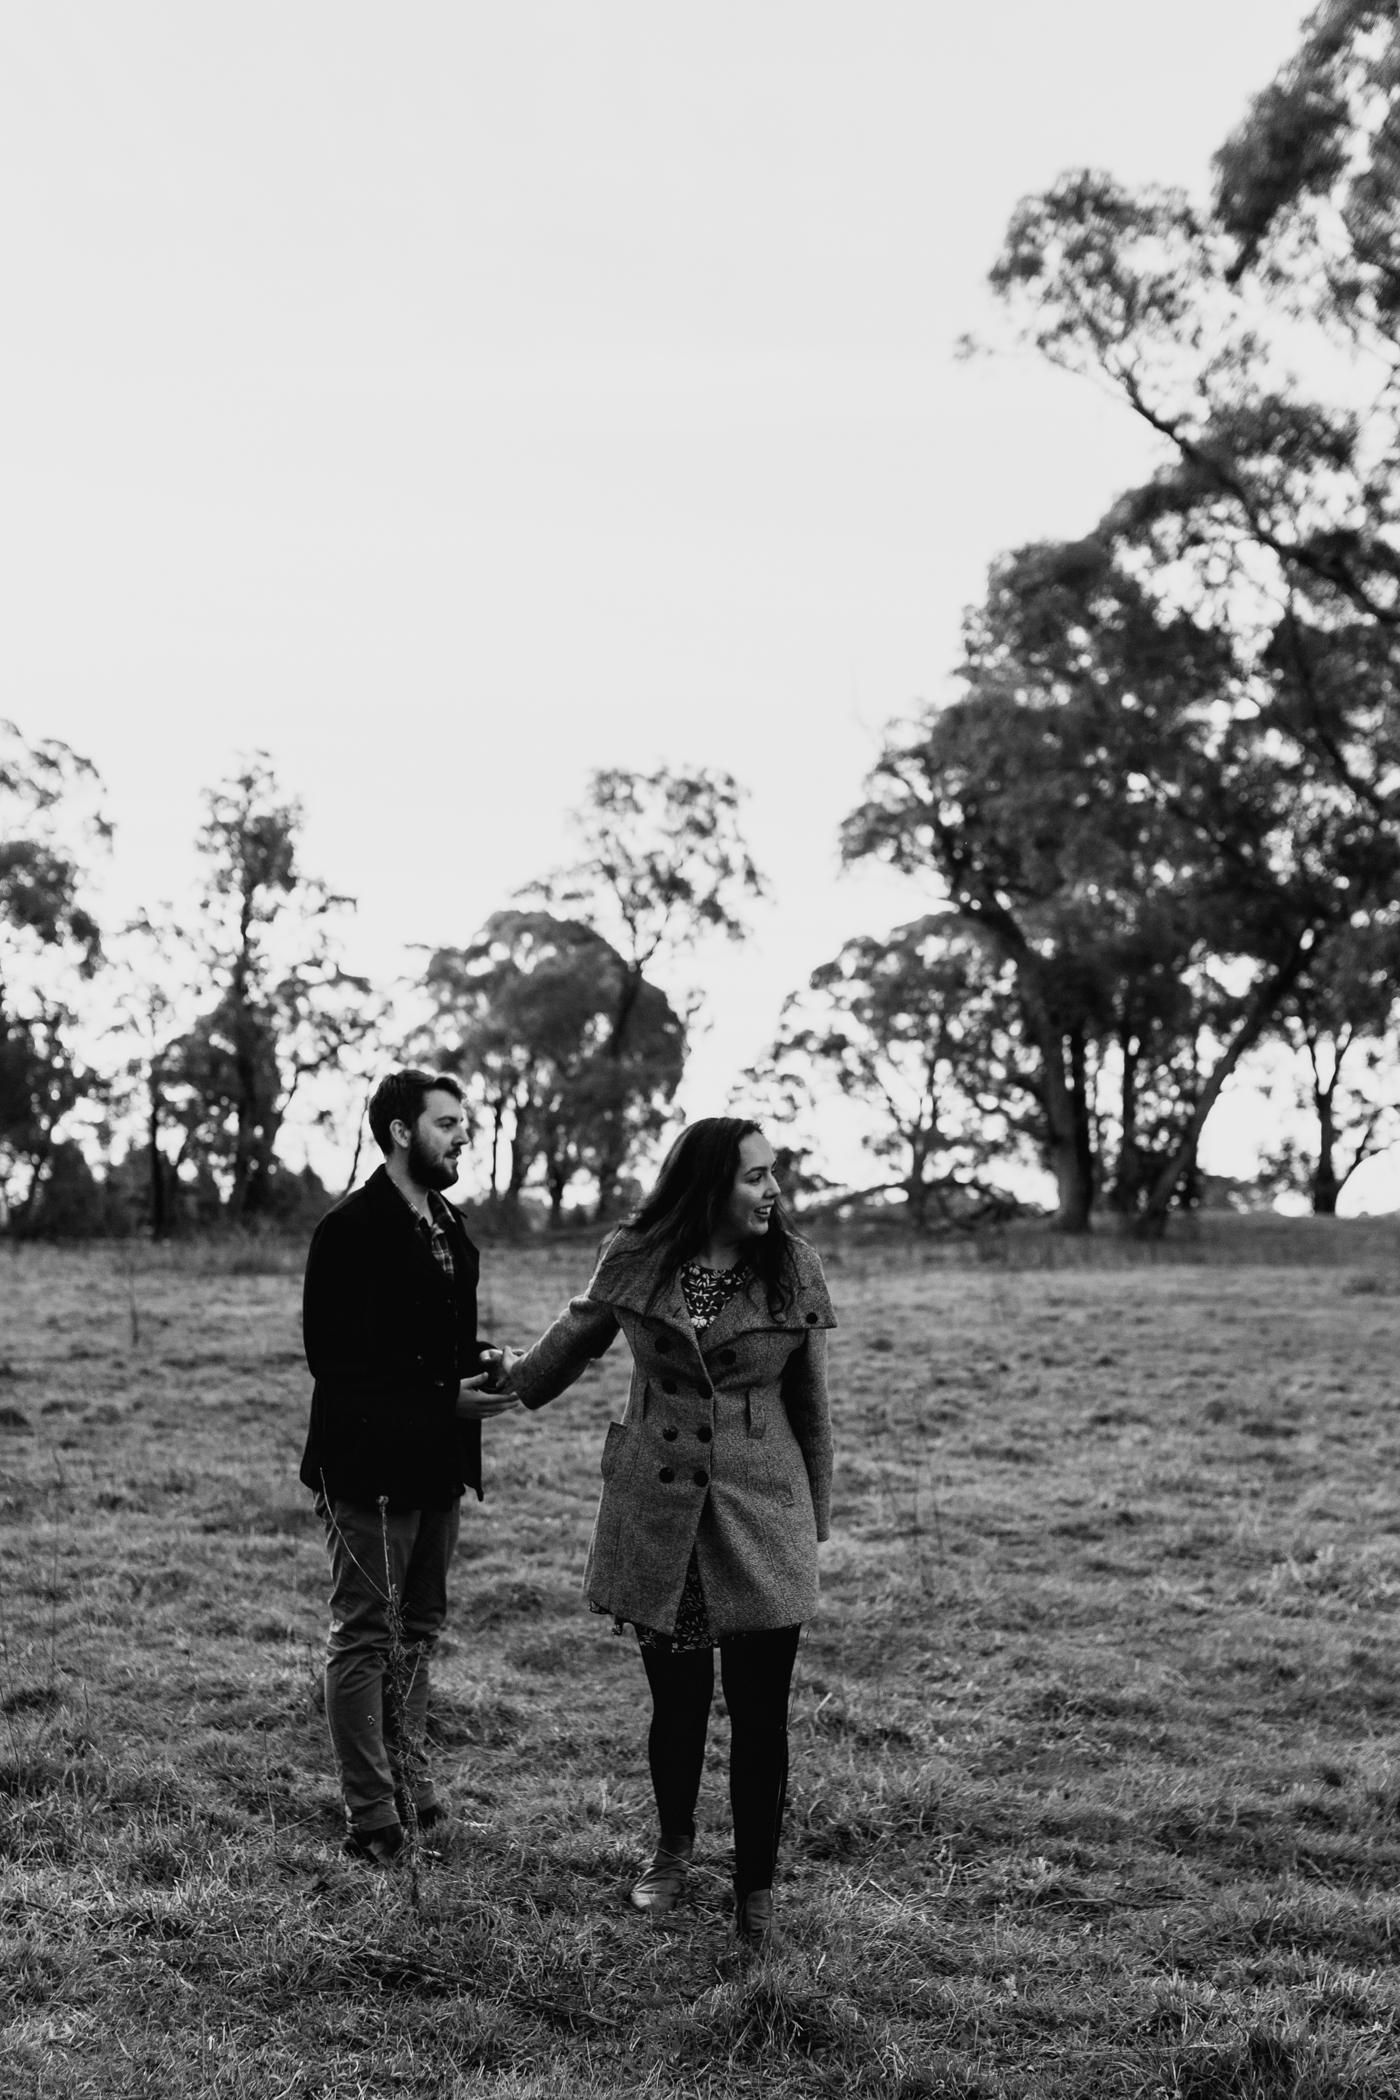 Kate & Kieran - Southern Highlands Engagement - Samantha Heather Photography-75.jpg